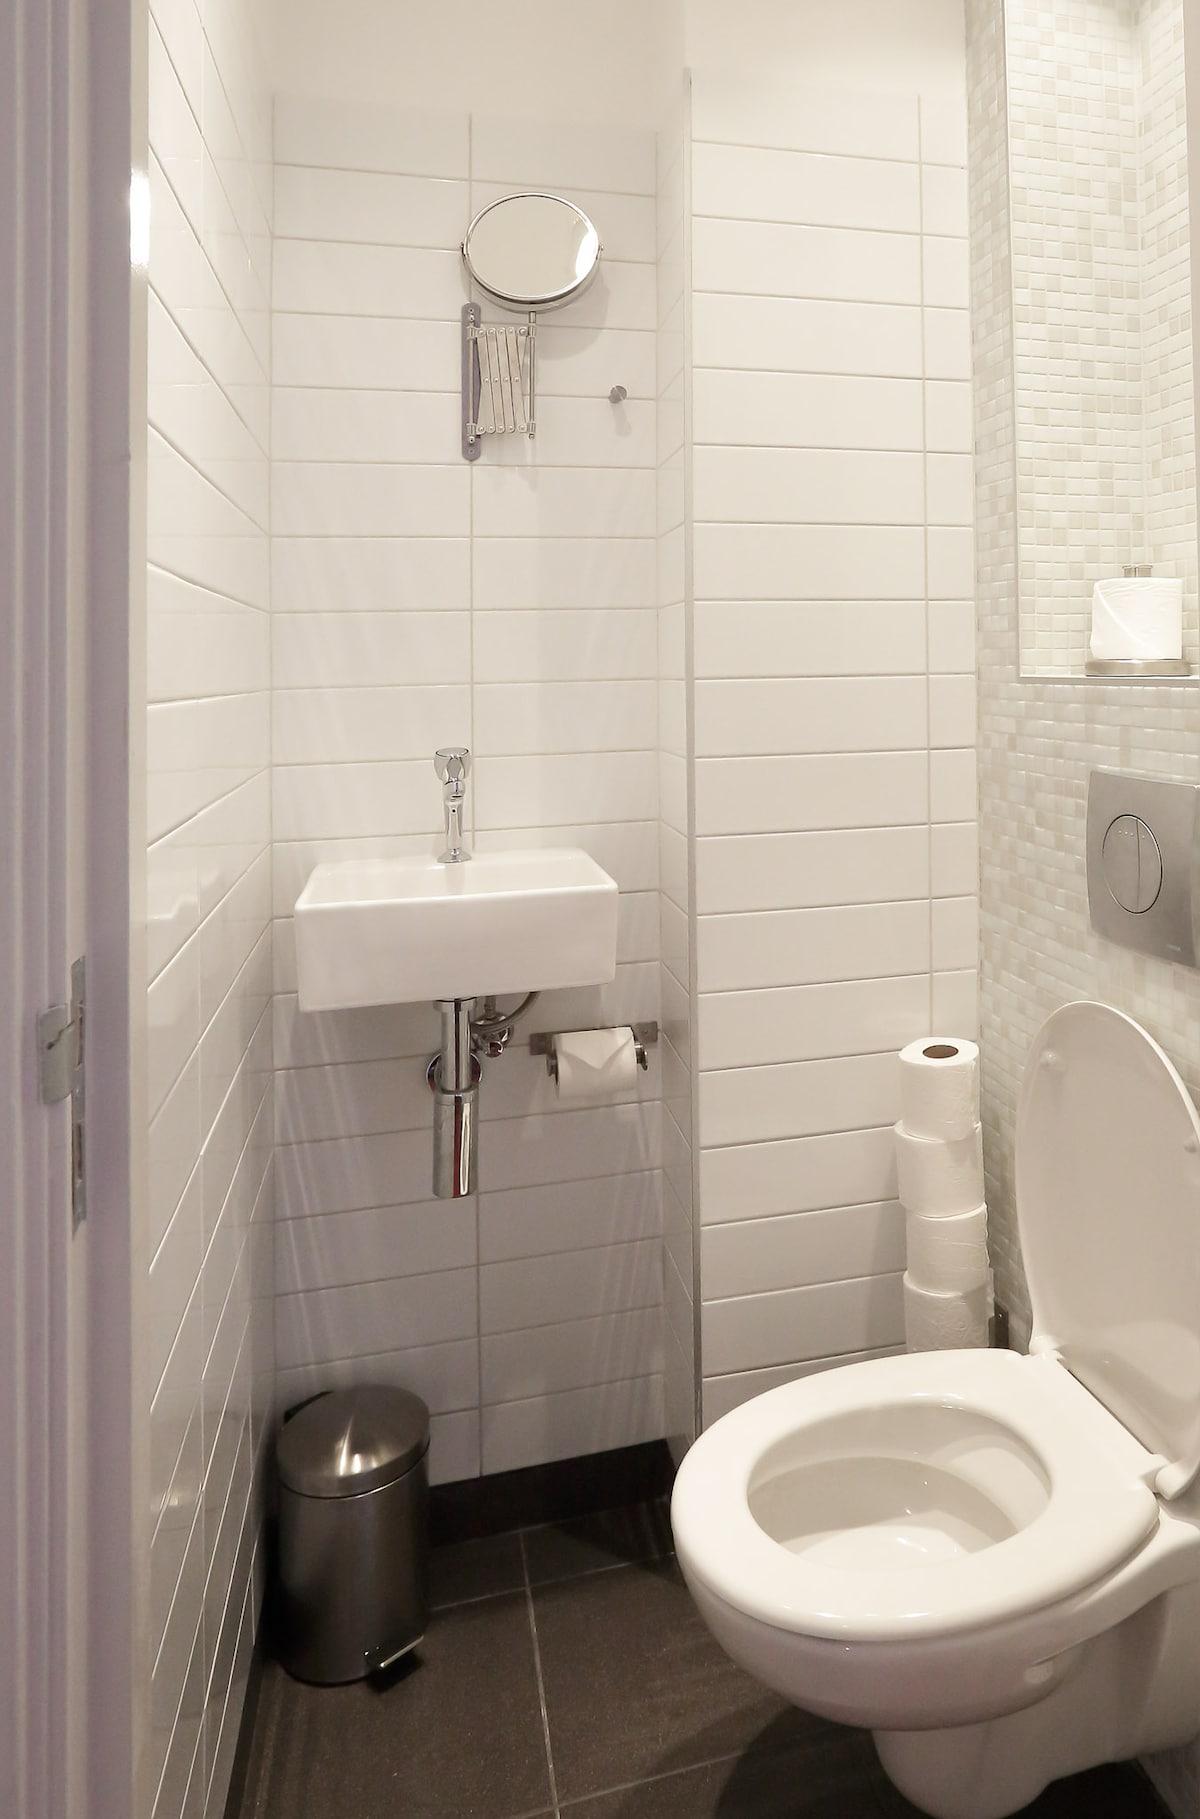 Separate private toilet in the studio (1)